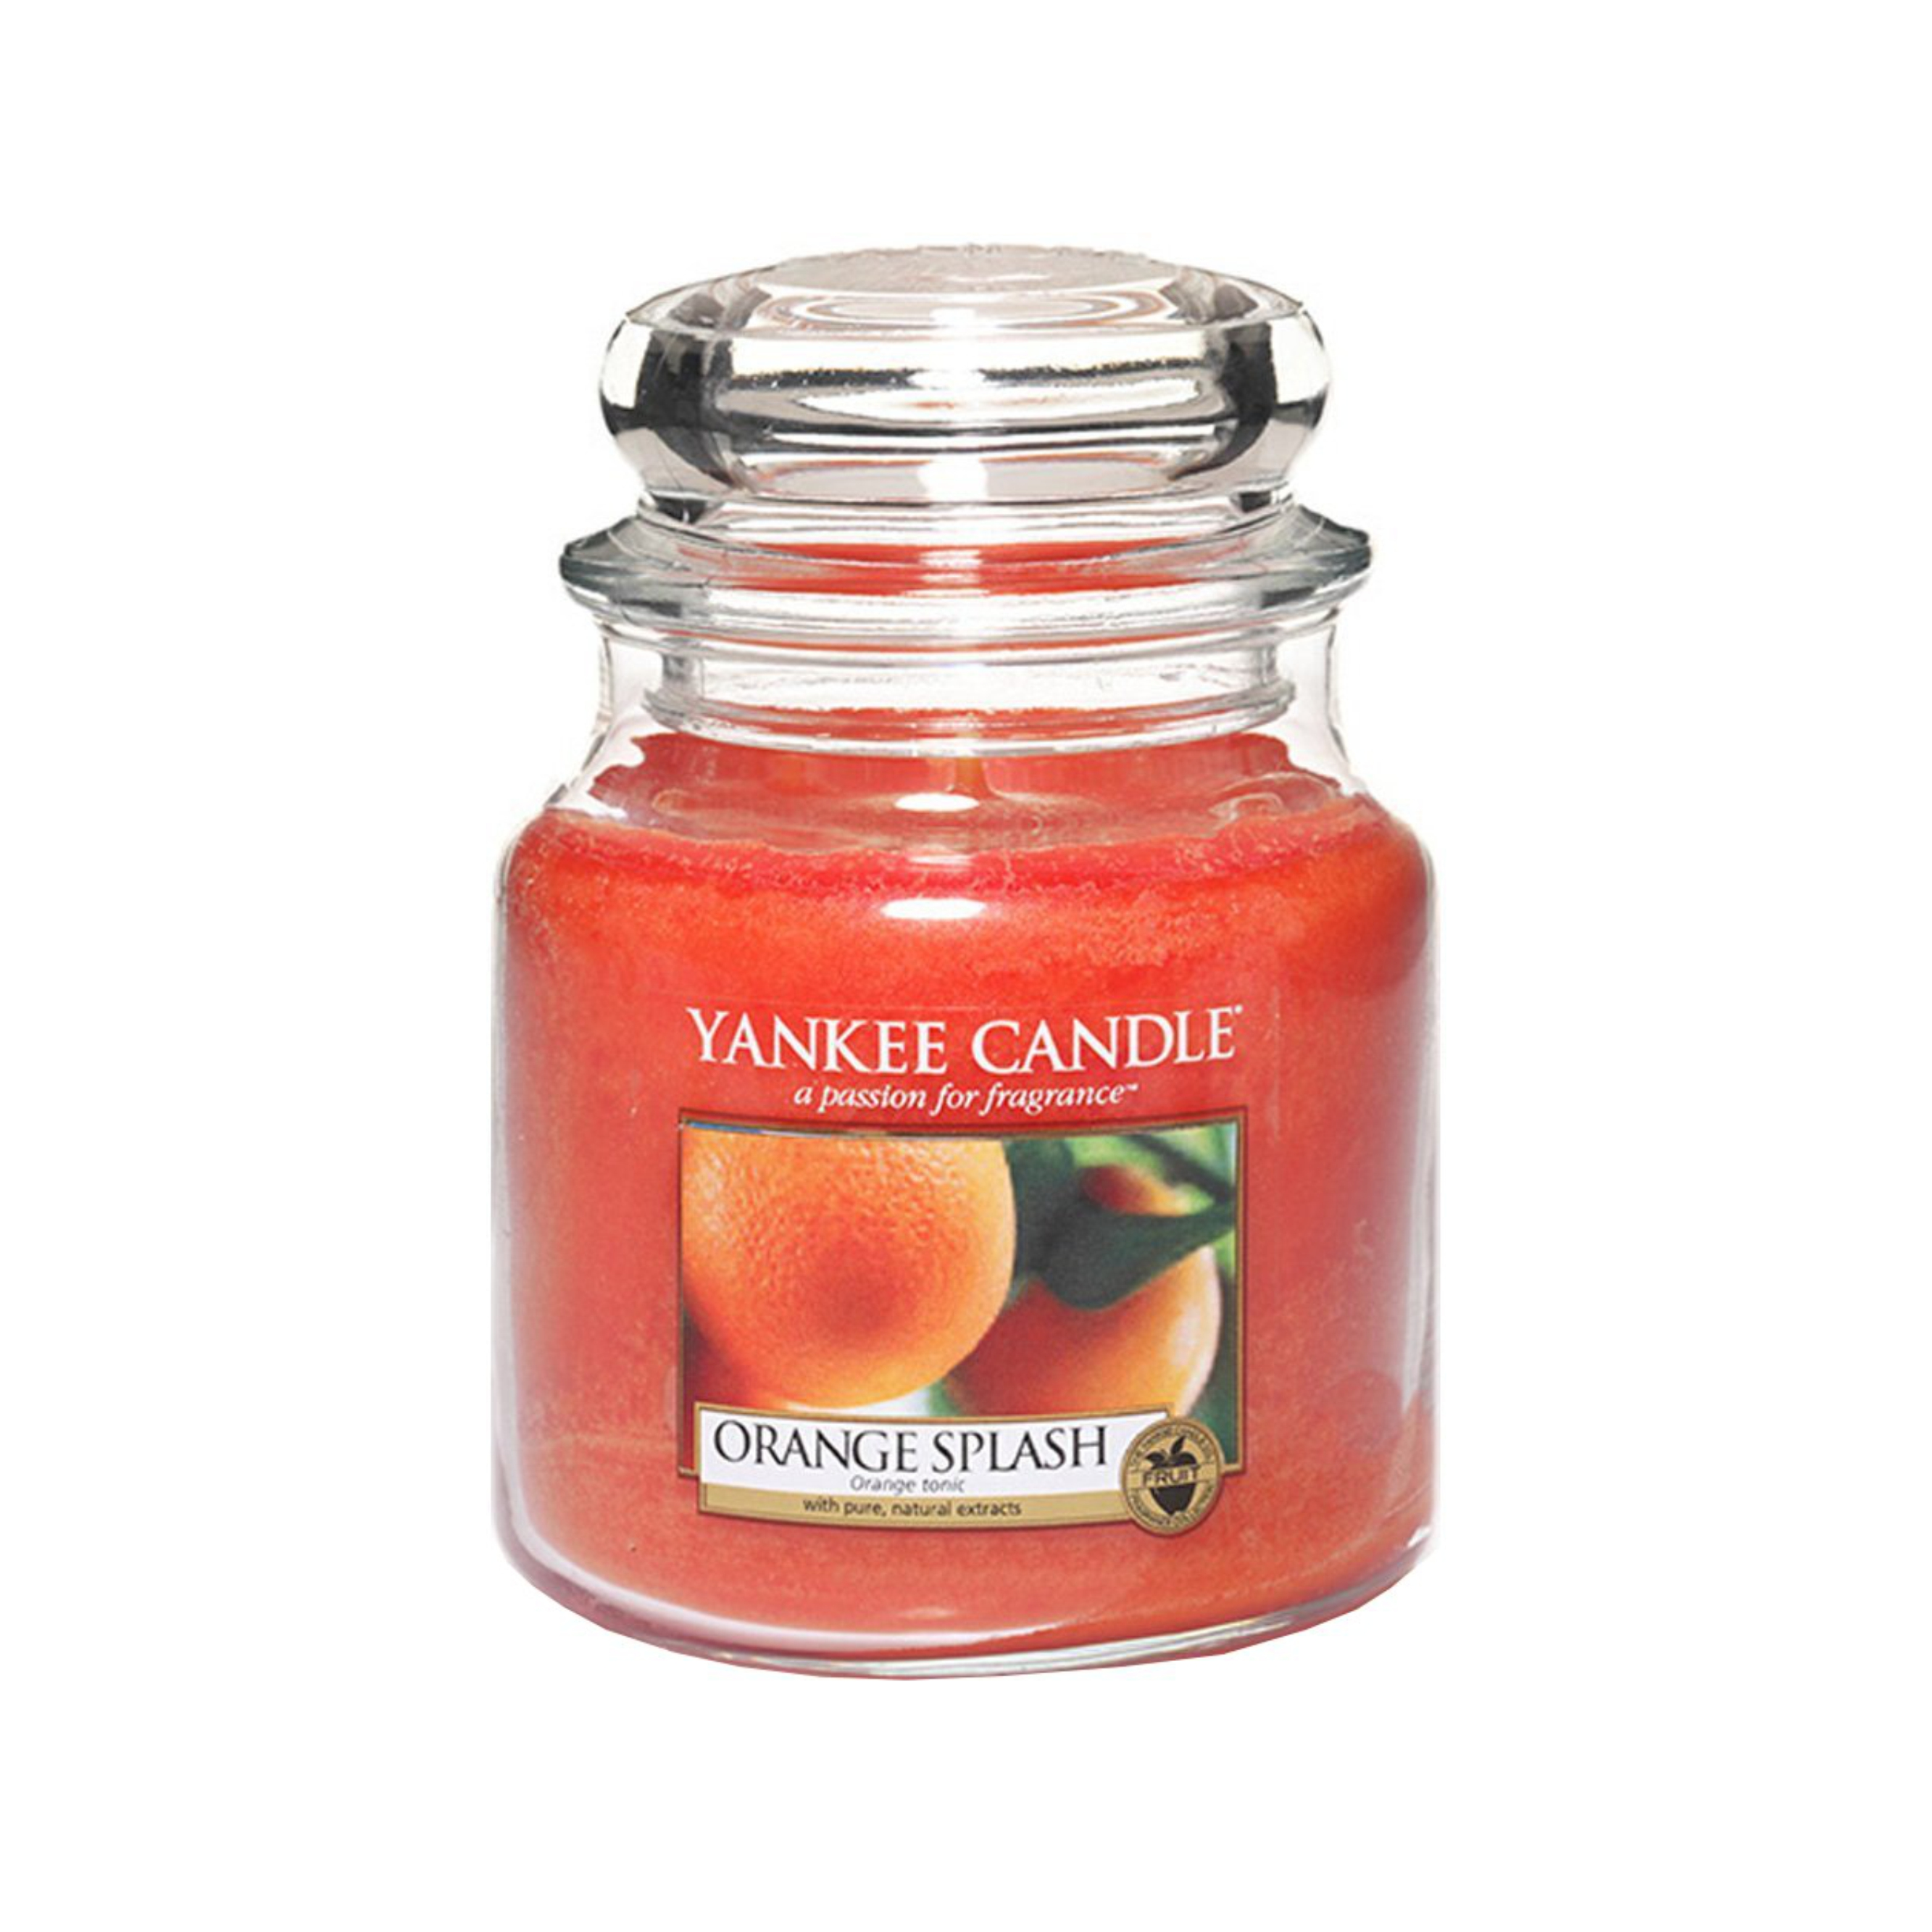 Yankee Candle 411g Orange splash